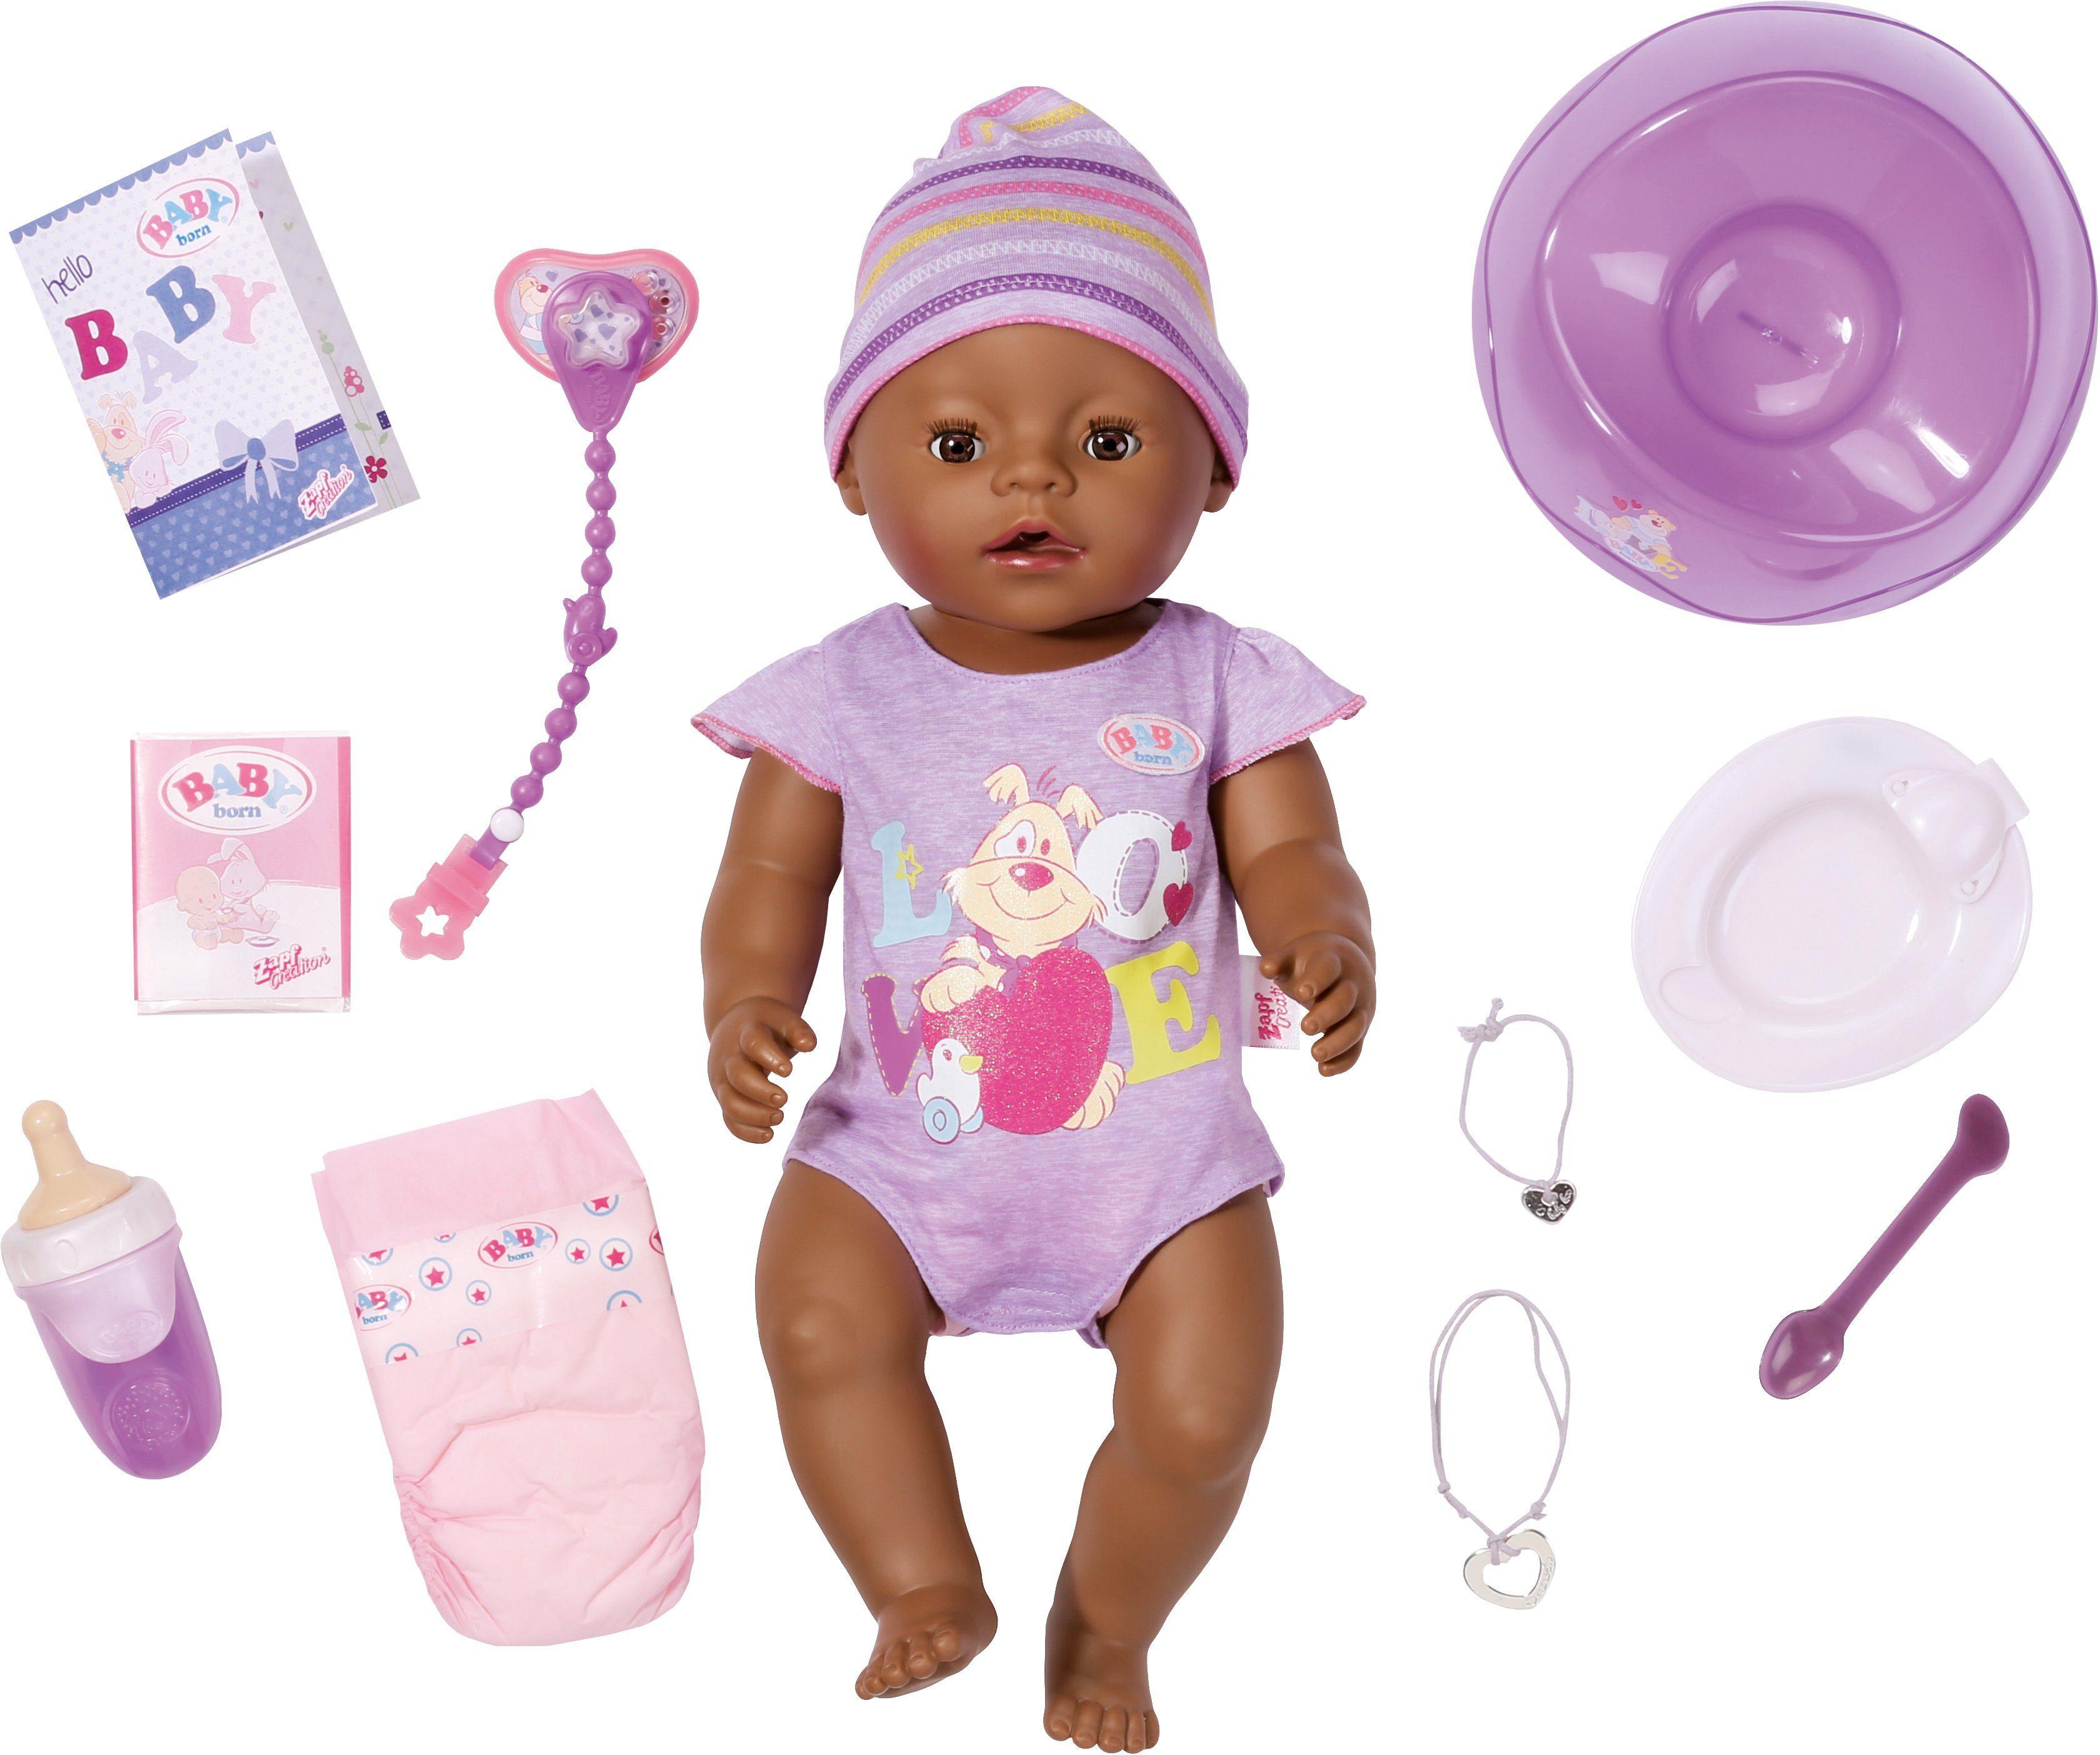 Zapf Creation Interaktive Babypuppe, »BABY born® Interactive Ethnic«